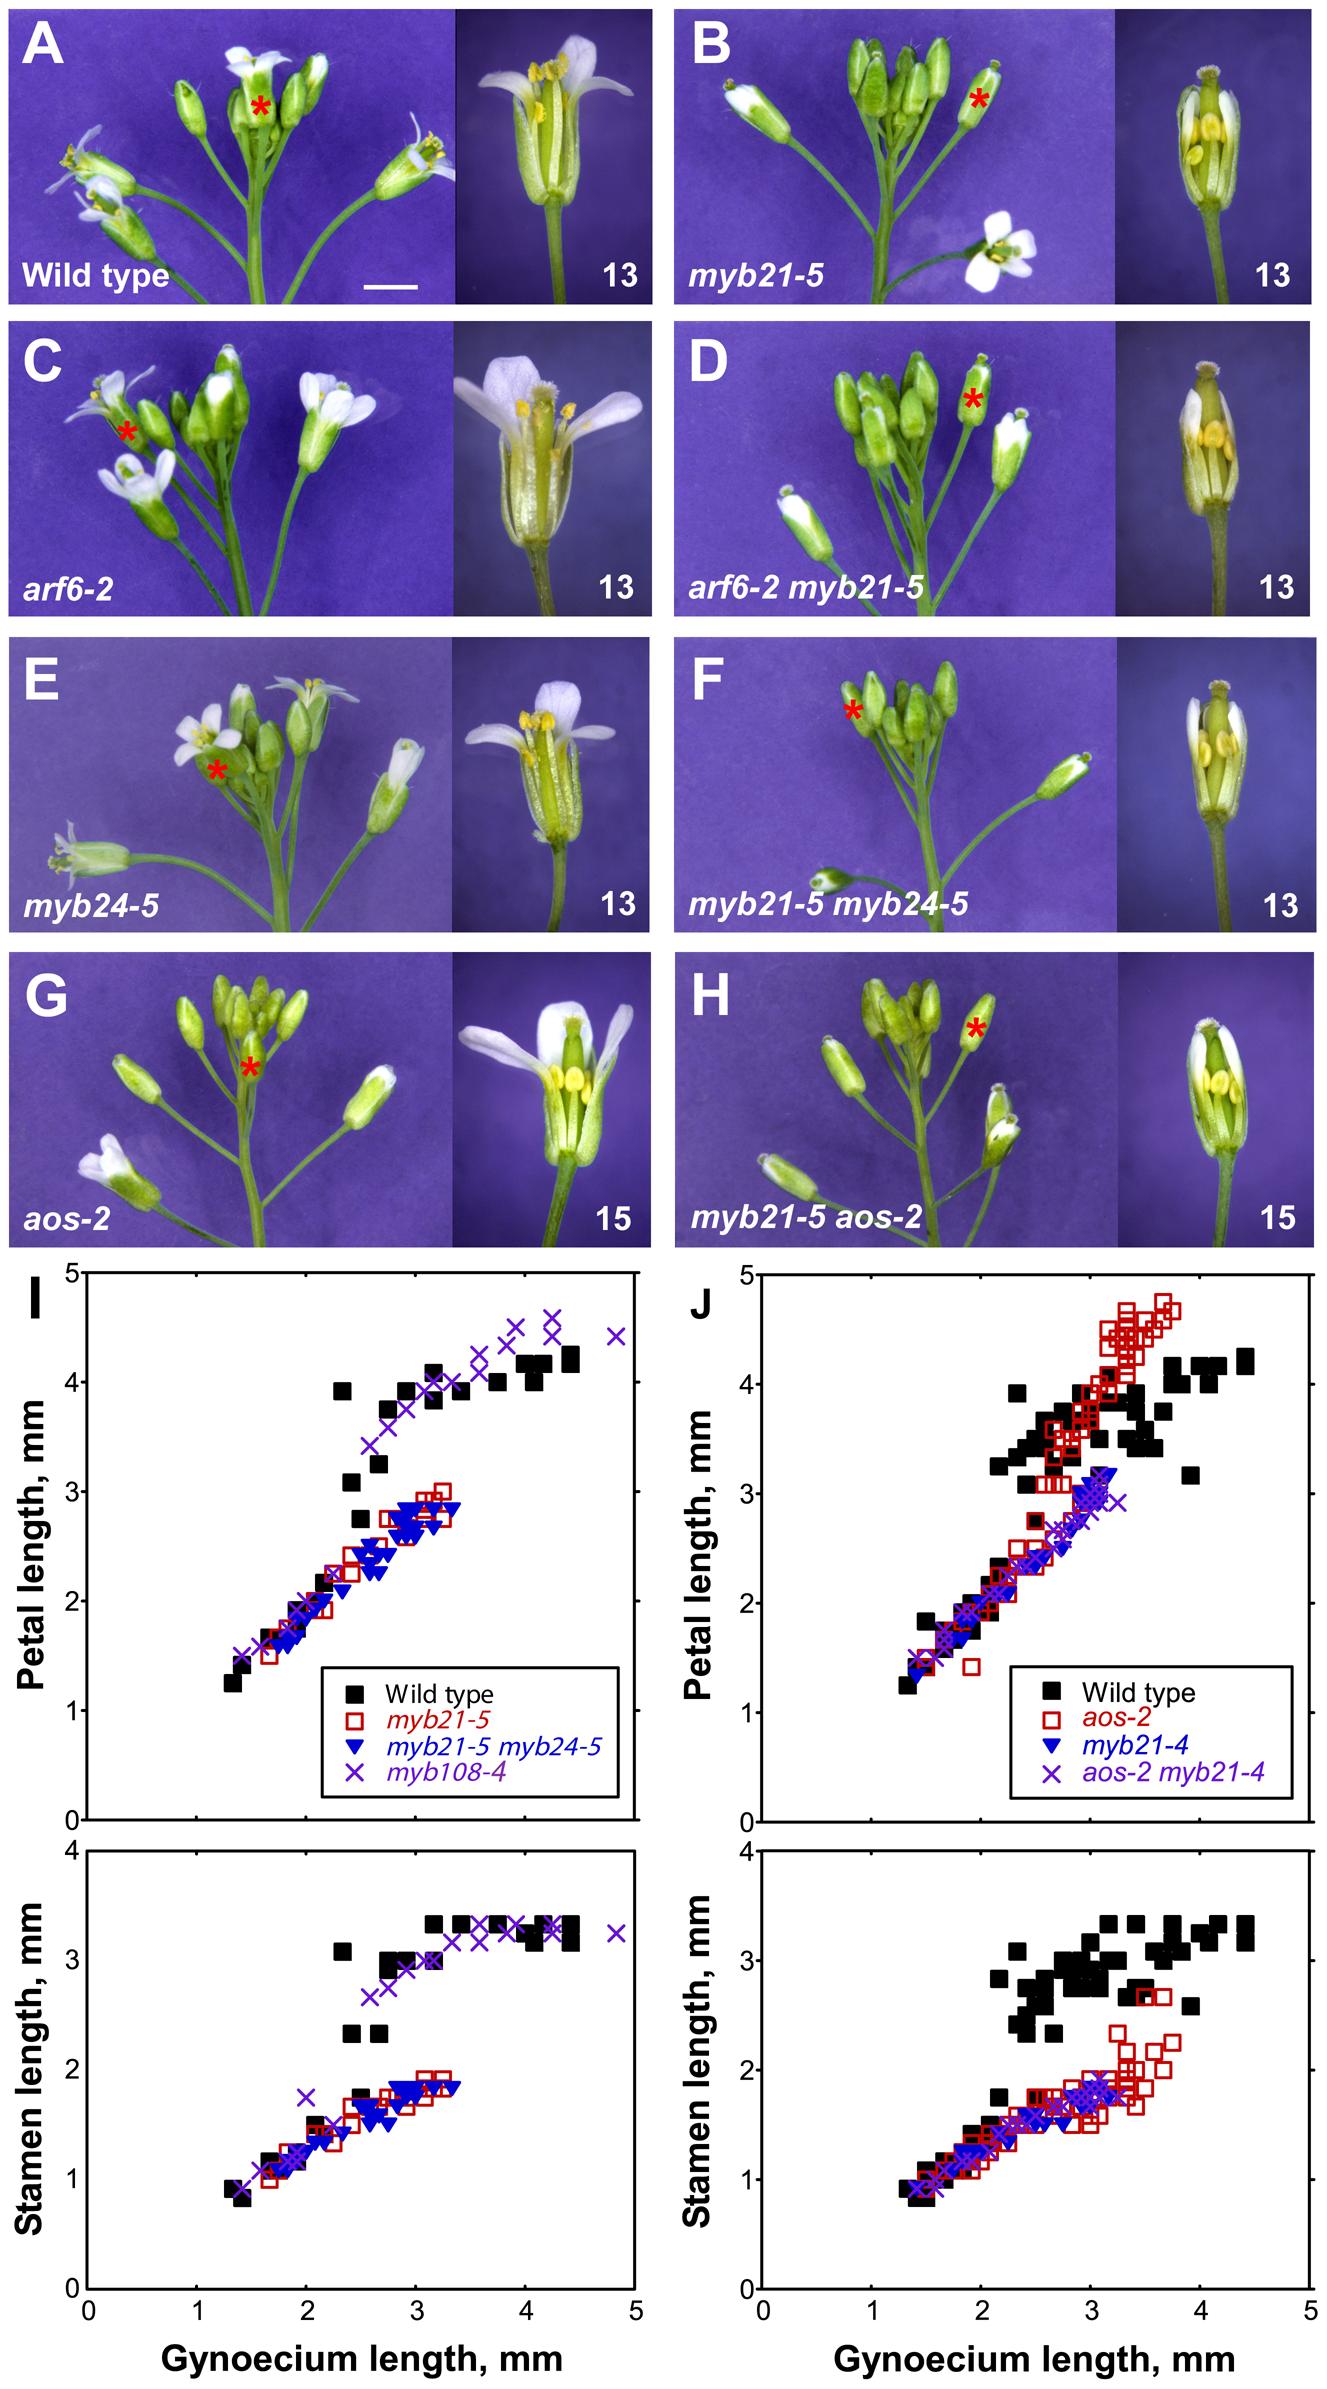 Inflorescence apices and flower phenotypes of <i>myb21</i>, <i>myb24</i>, <i>myb108</i>, and <i>aos</i> mutants.